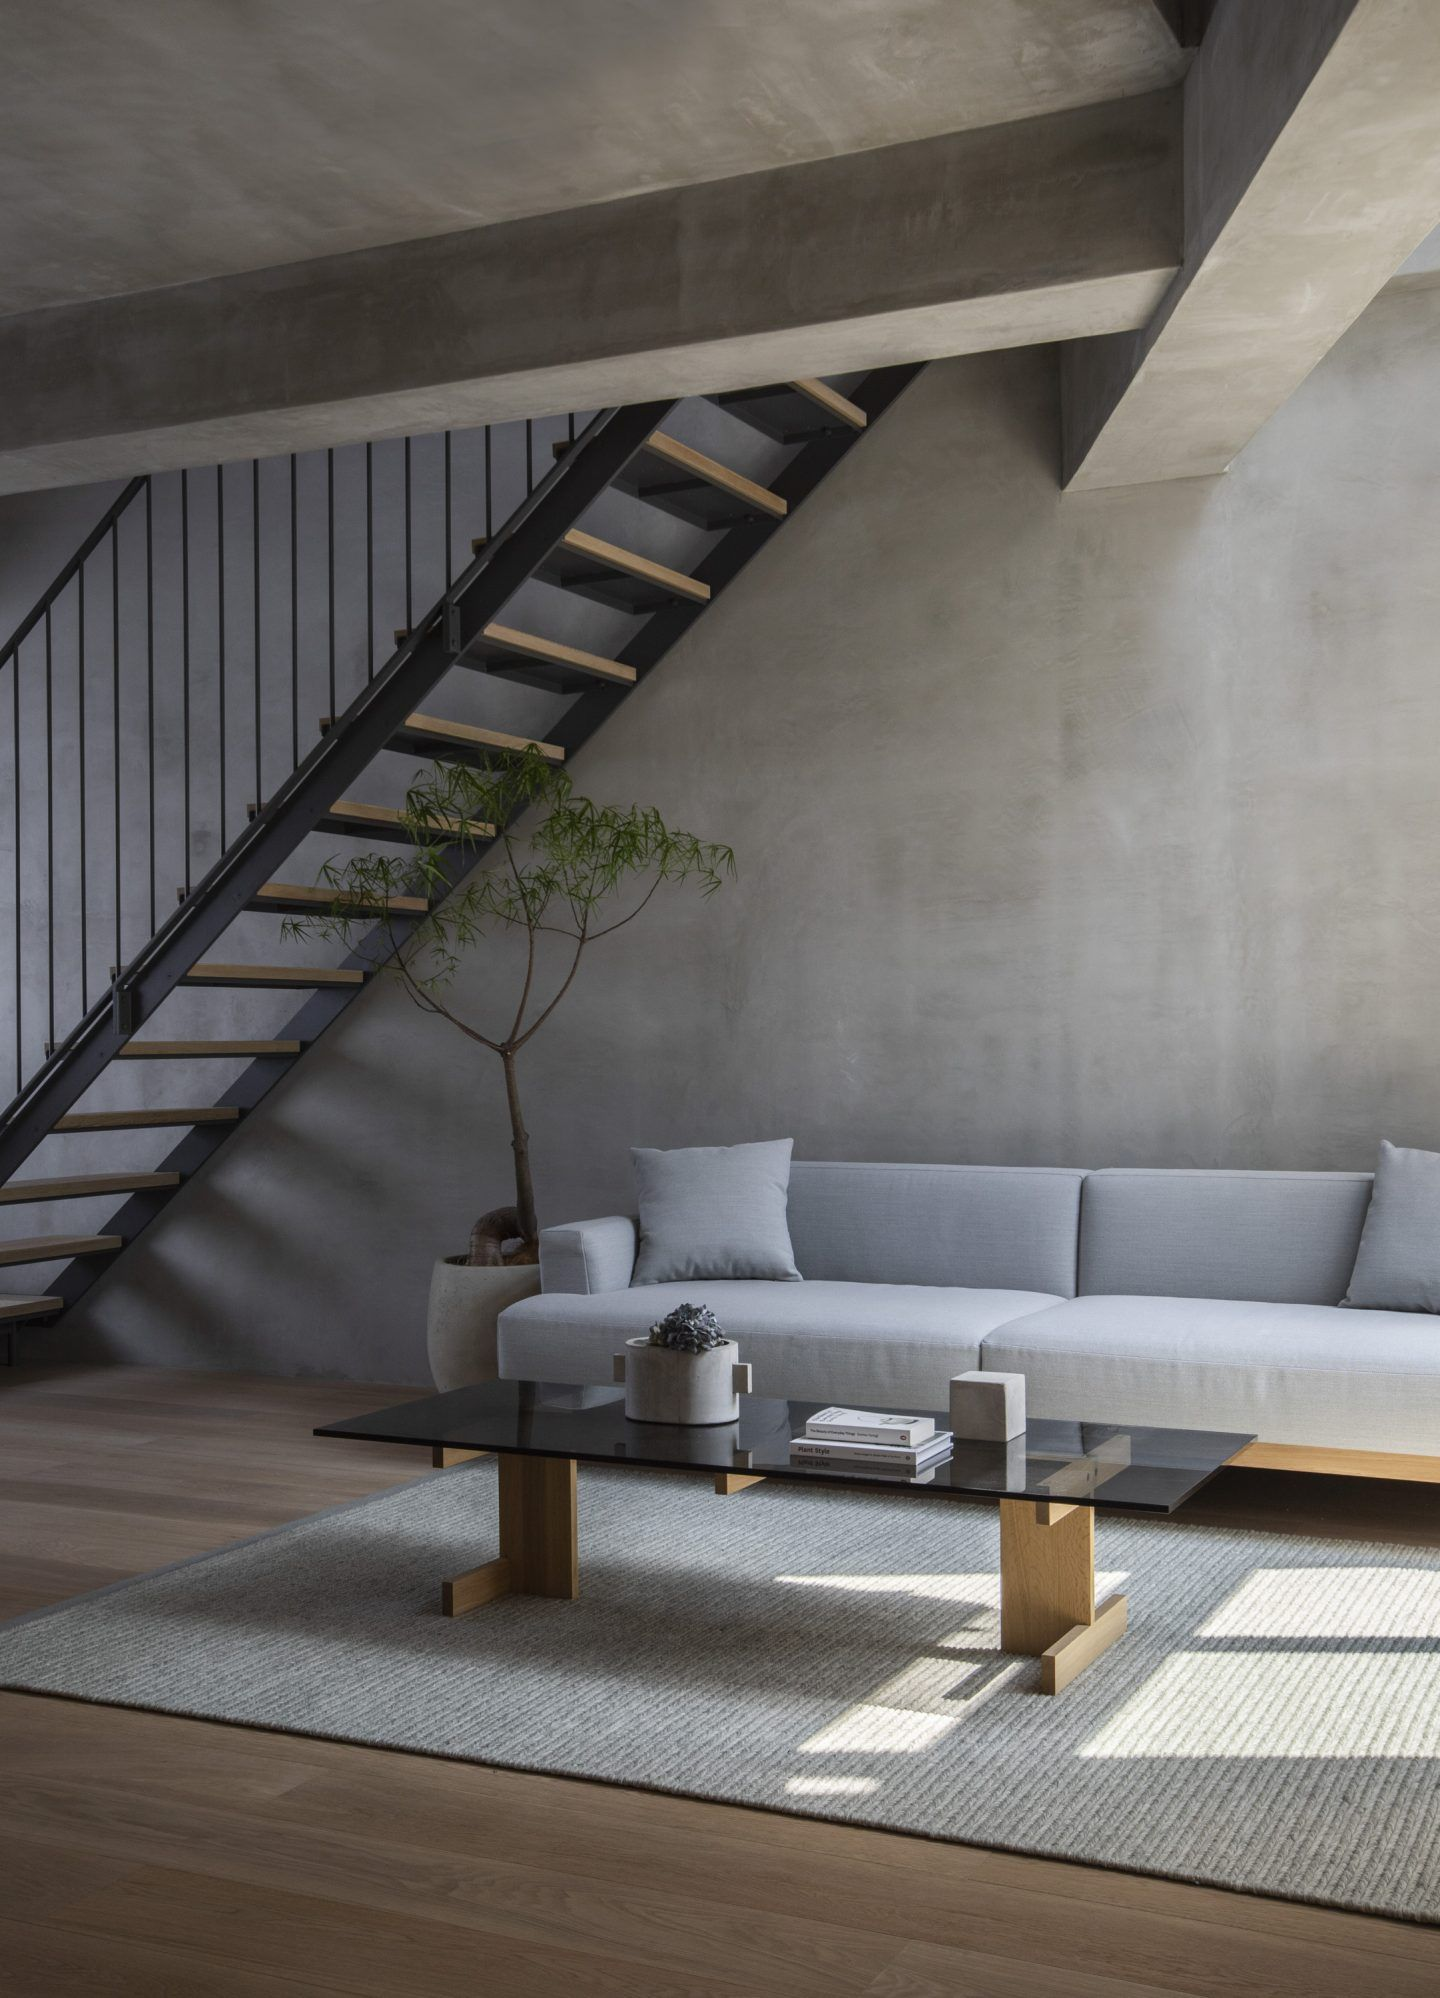 IGNANT-Design-Norm-Architects-Kinuta-Terrace-08